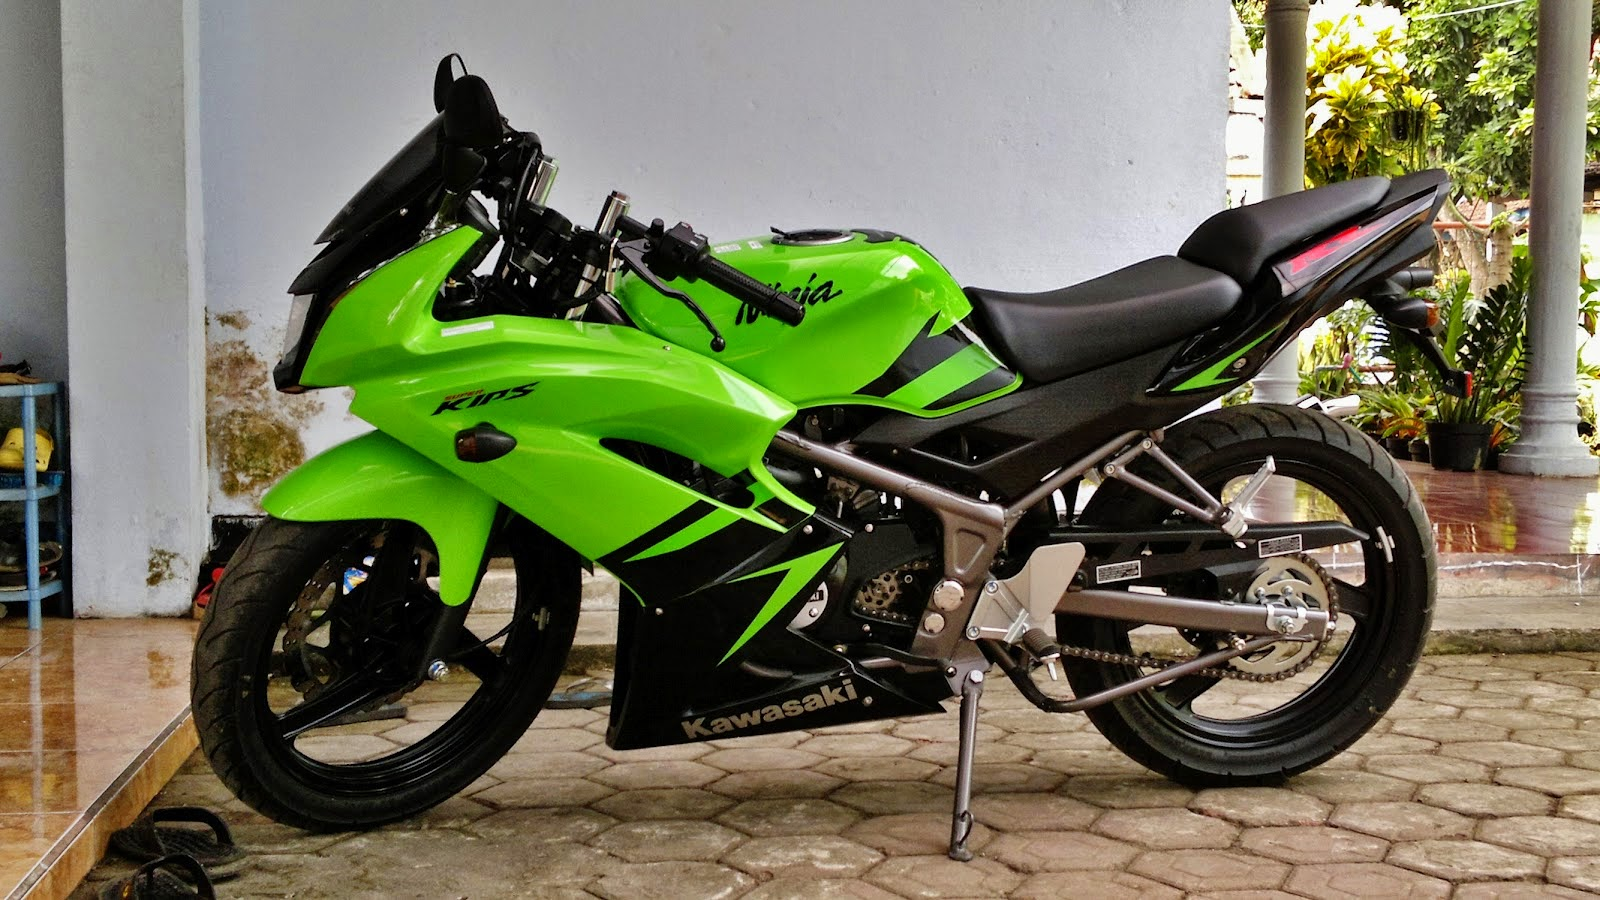 harga dan spesifikasi kawasaki ninja r november 2015 | harga motor